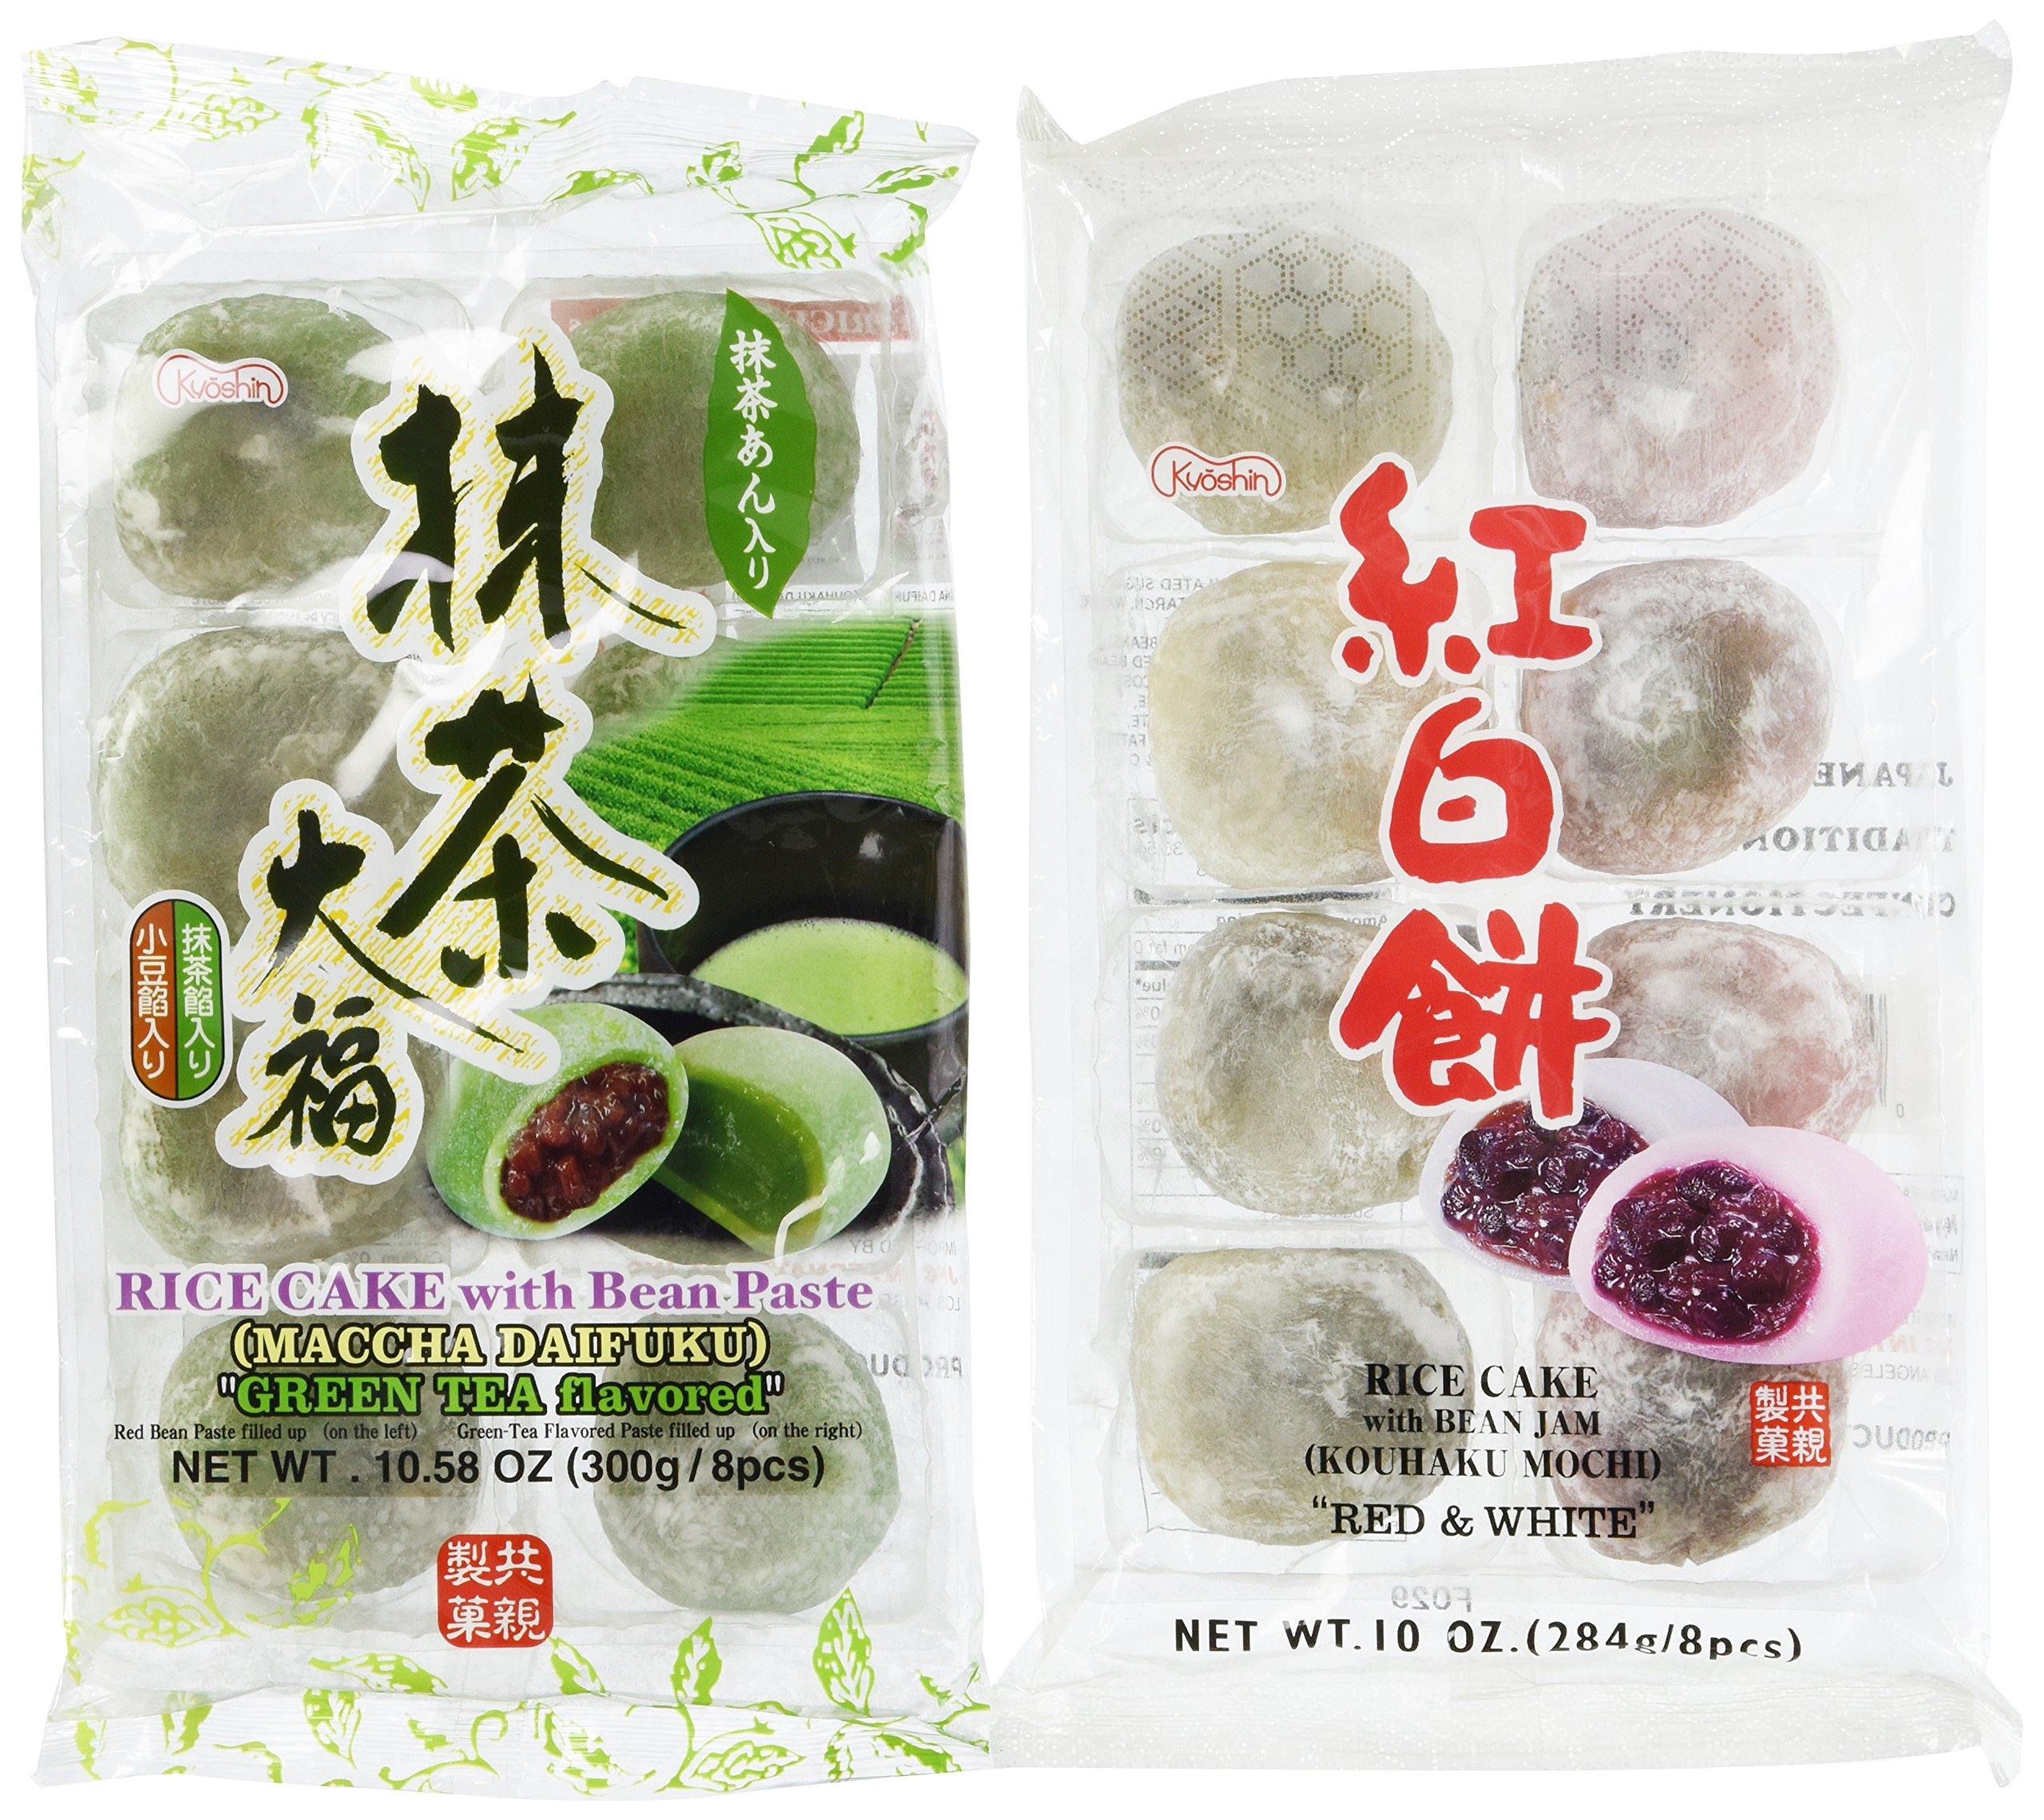 Japanese Green Tea Mochi + Yomogi & Red Bean Mochi Sampler - 2x 8 Pc by Unknown